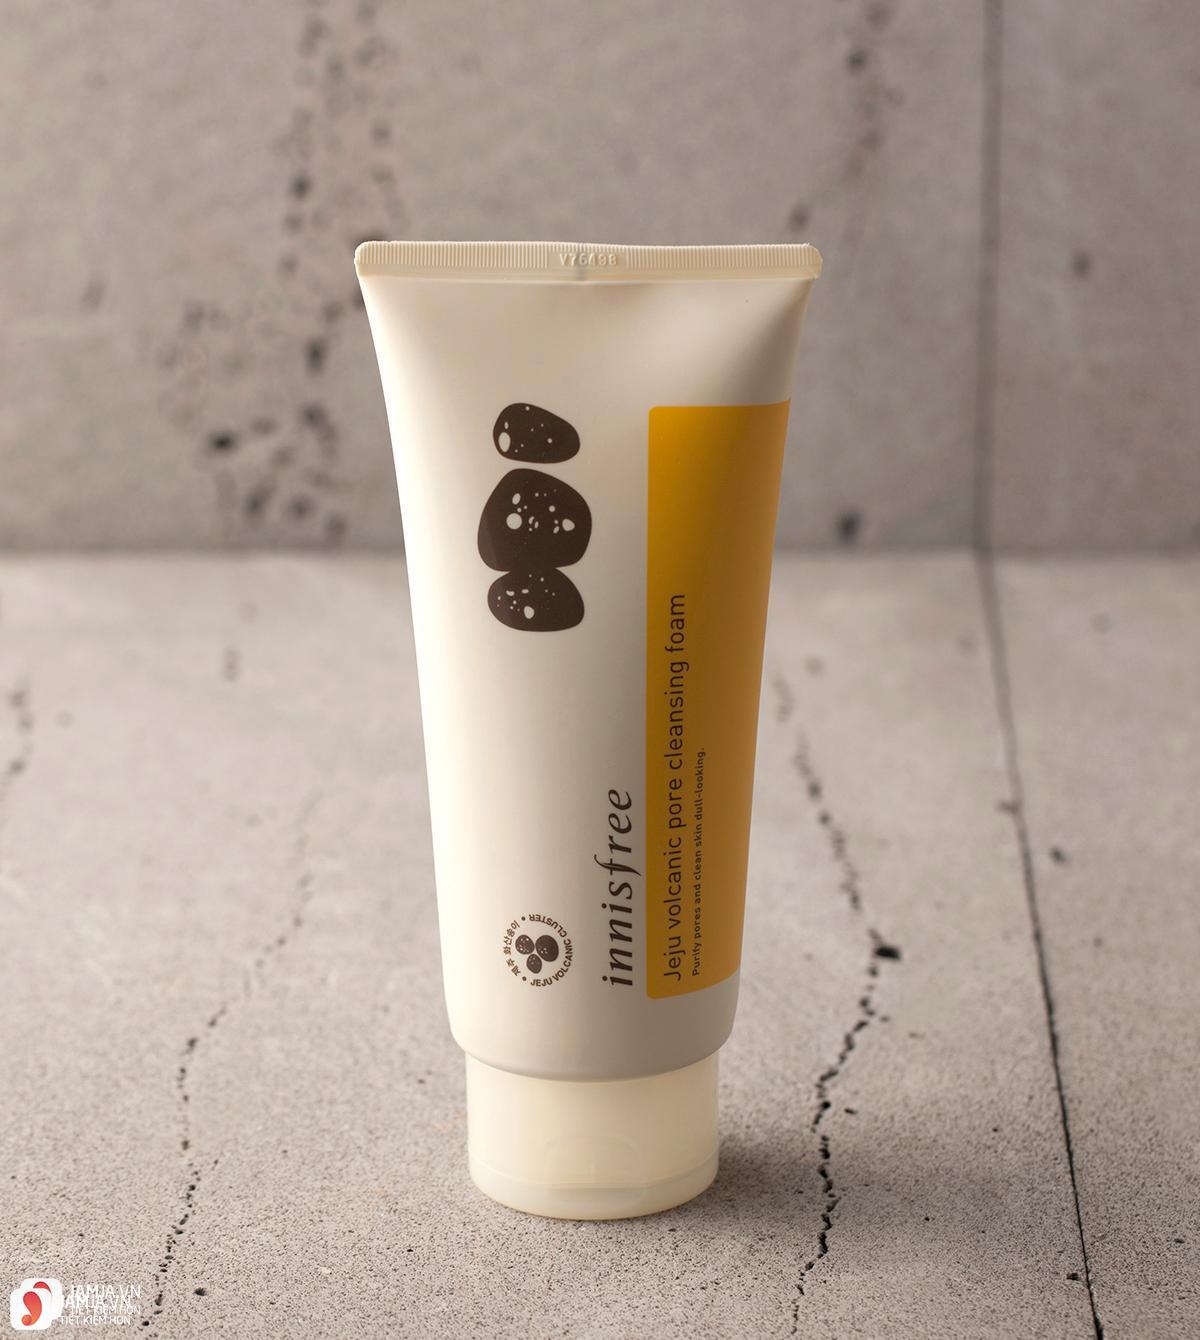 Sữa rửa mặtInnisfree Jeju Volcanic Pore Cleansing Foam